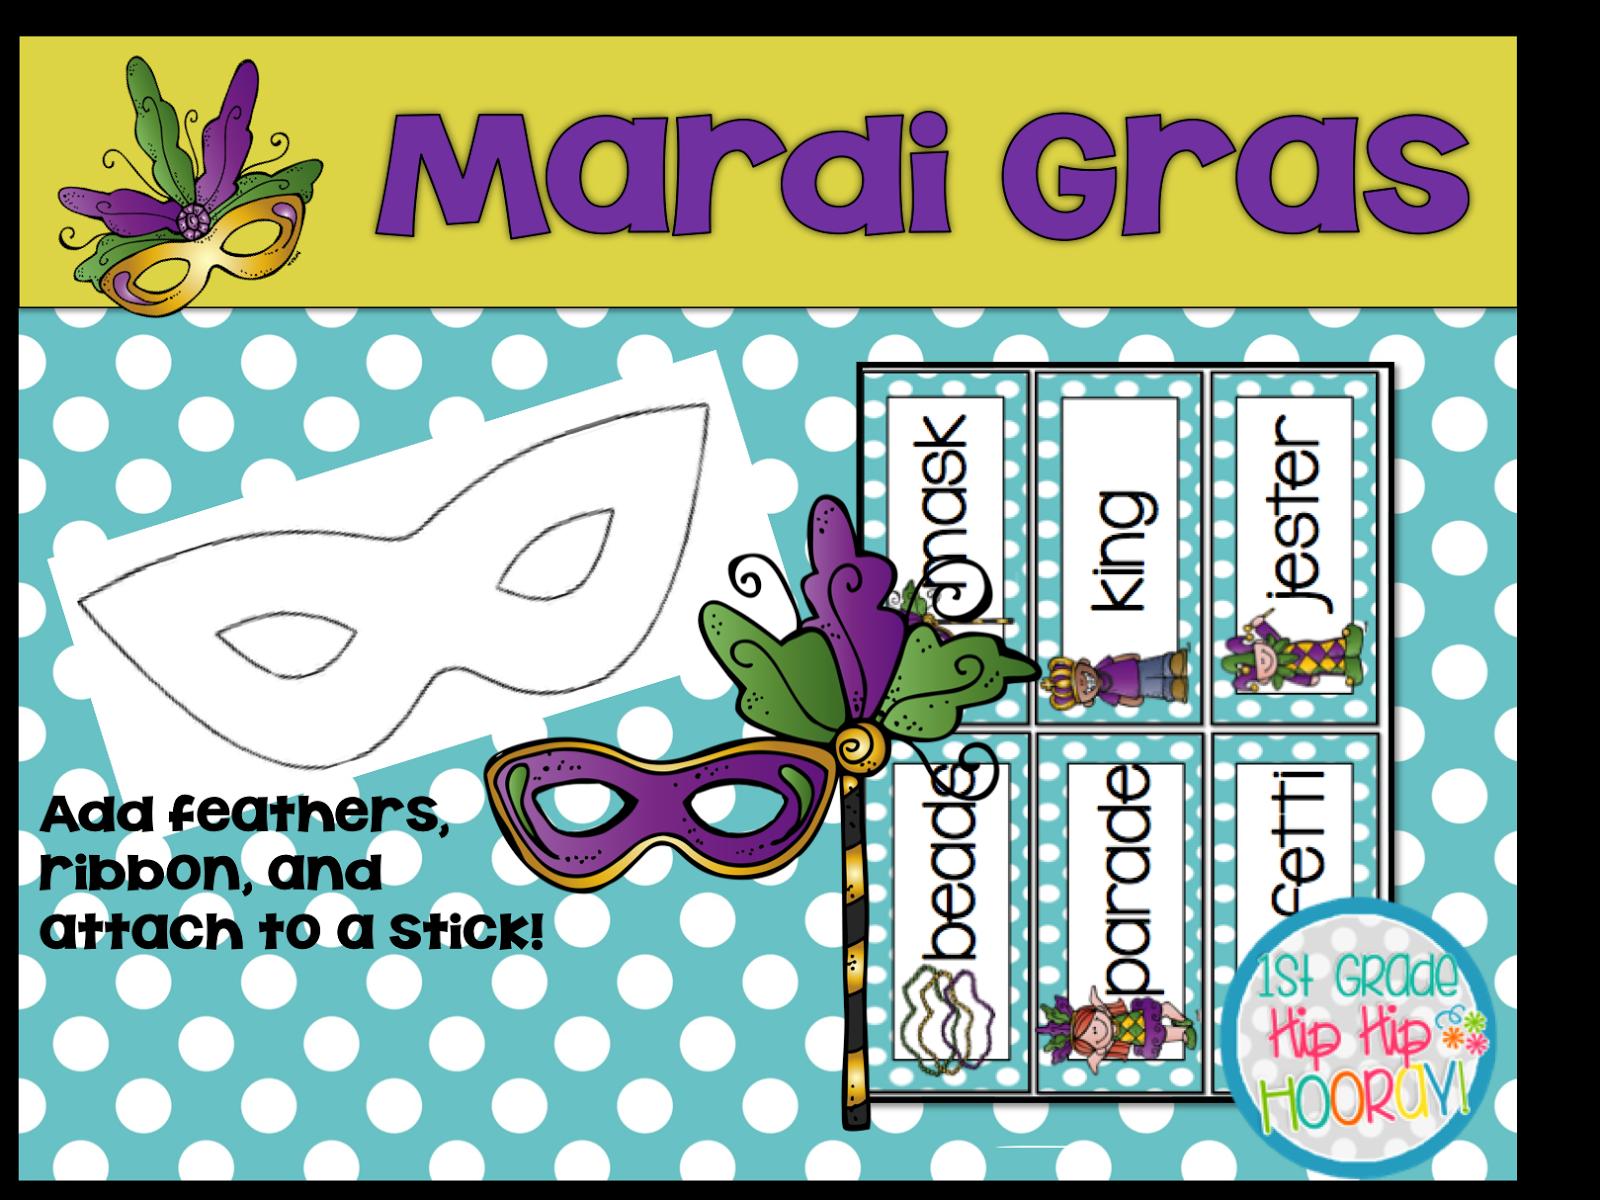 1st Grade Hip Hip Hooray!: Mardi Gras...February 28th!